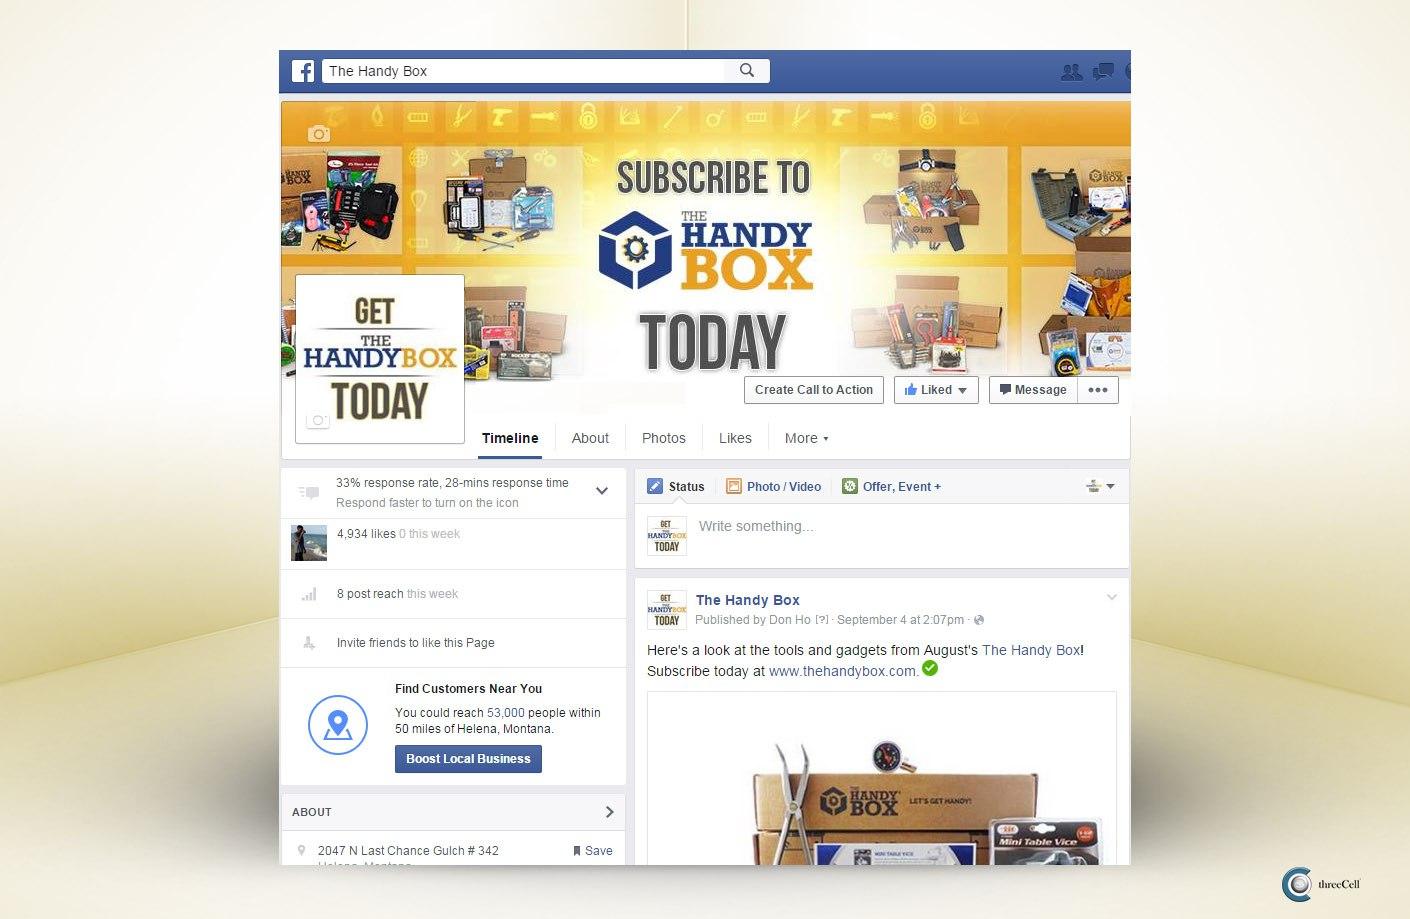 The Handy Box - Facebook Social Media Design